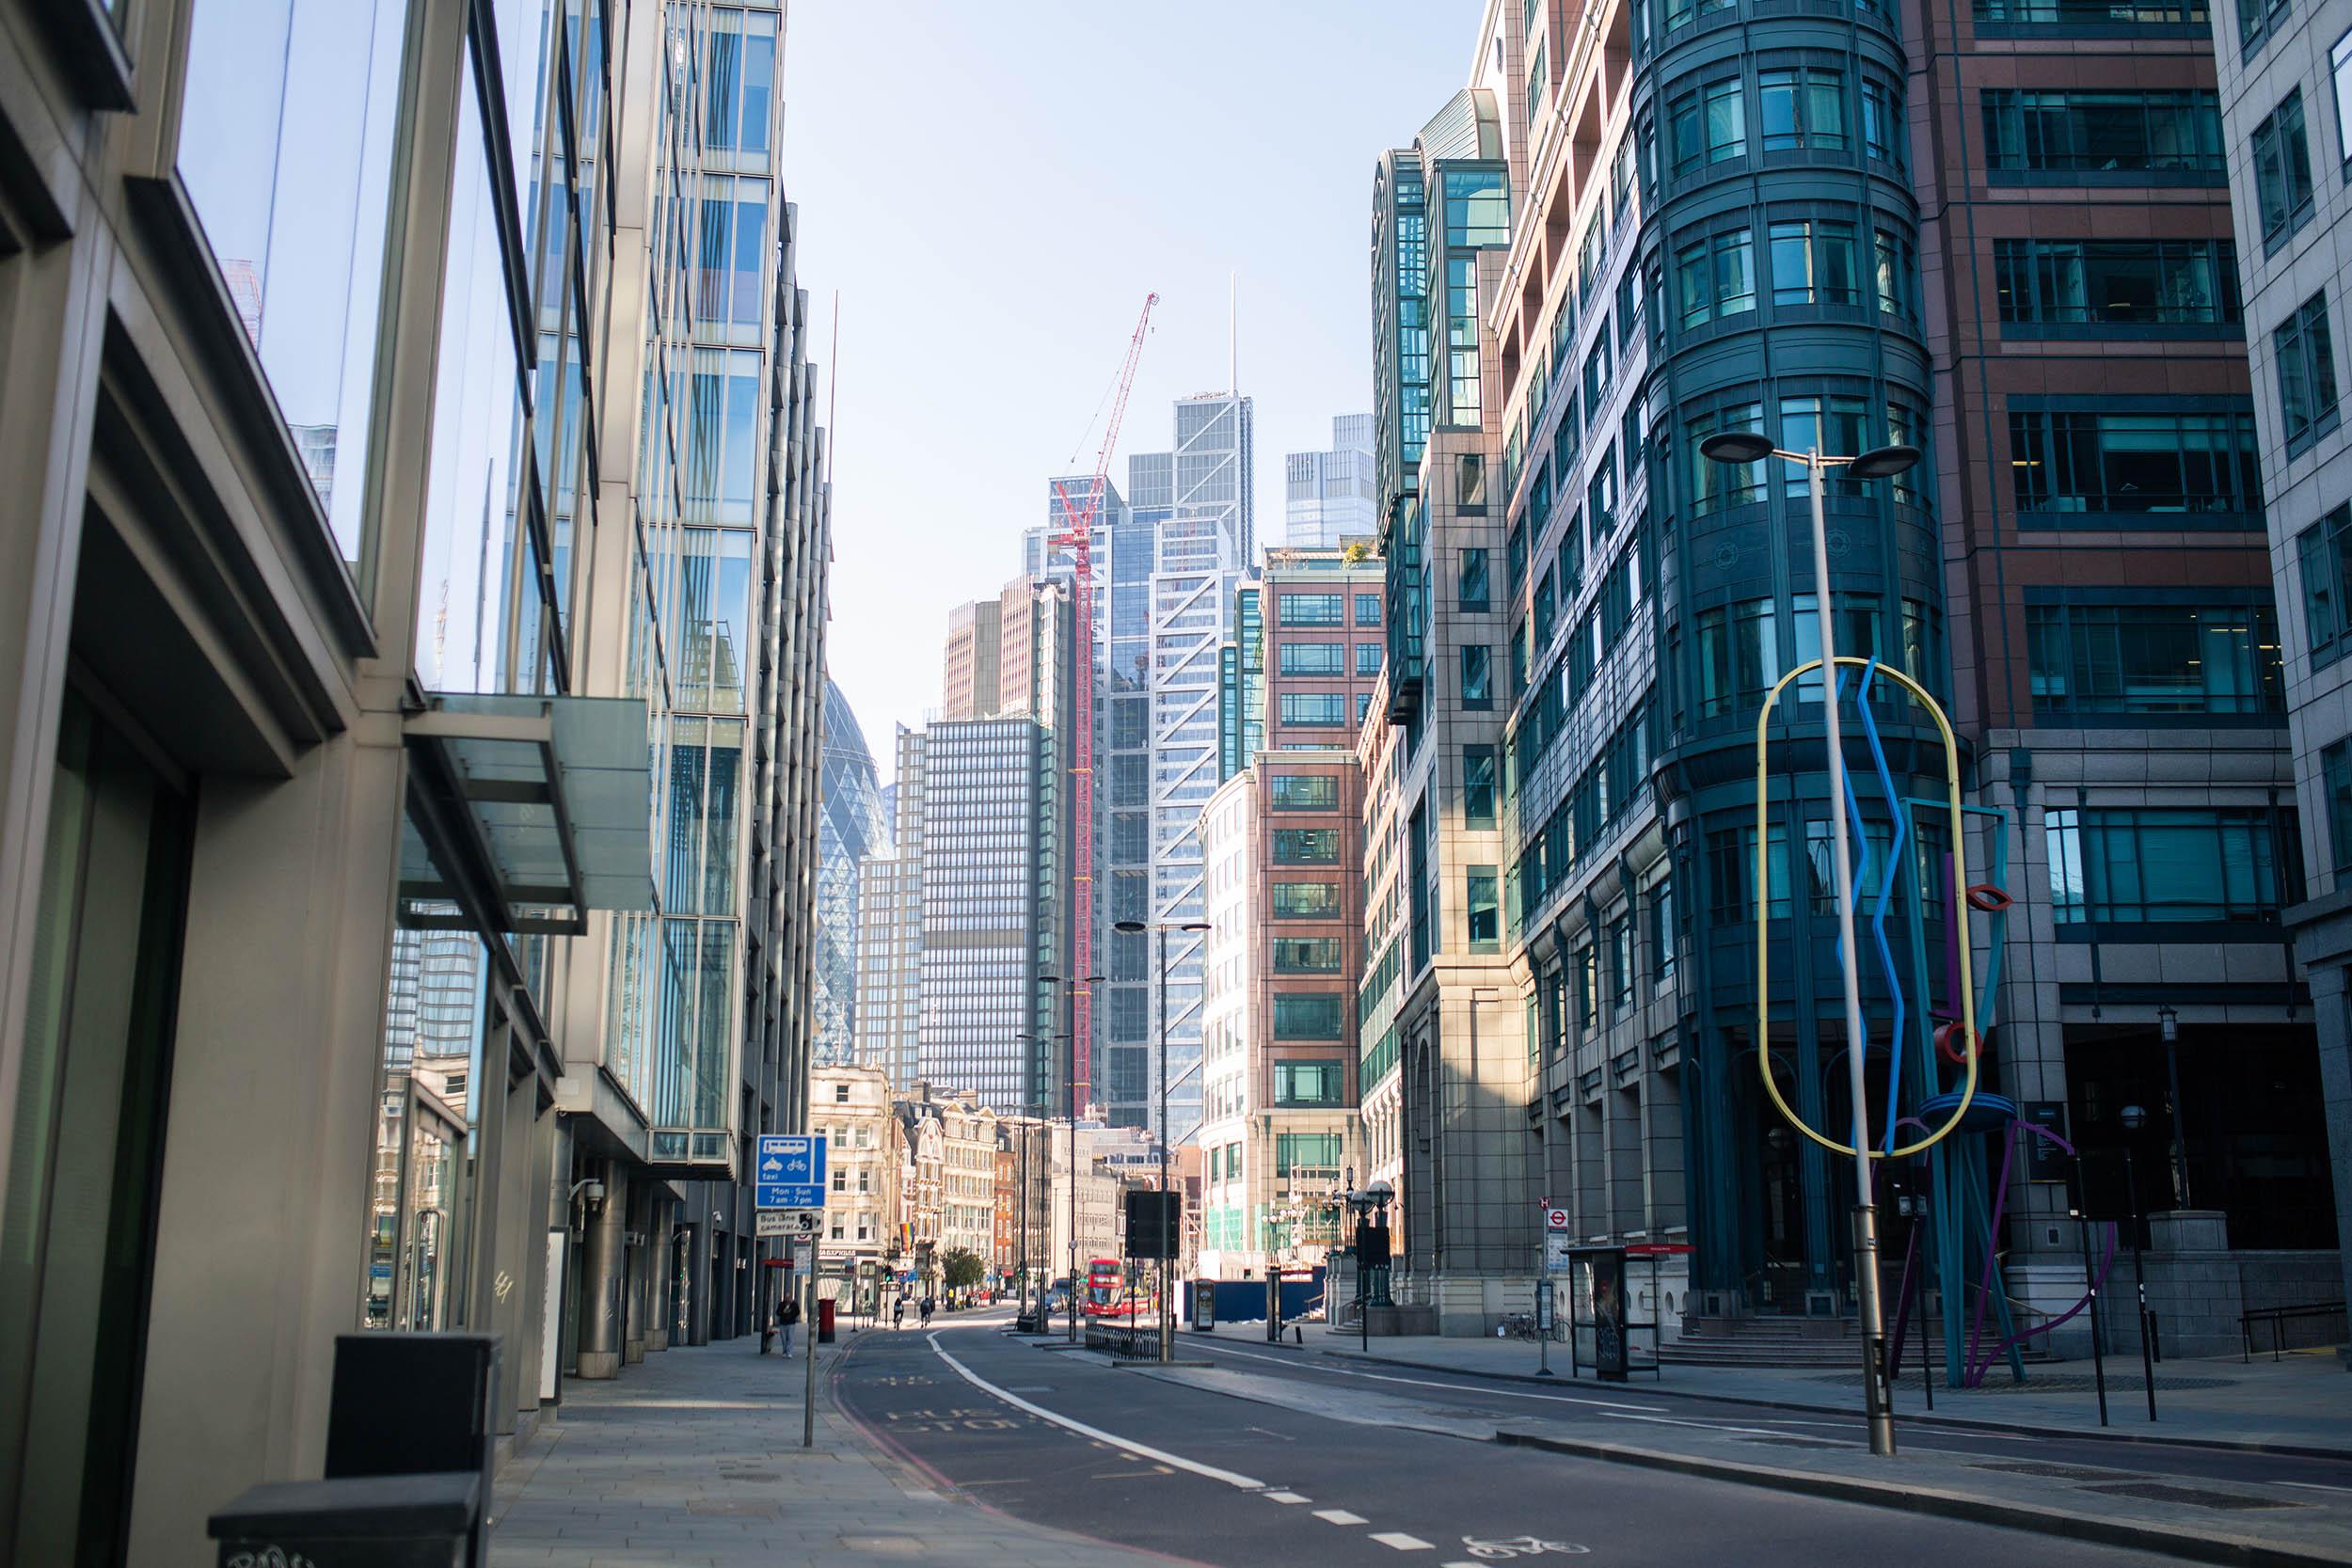 ENGLAND_LONDON_SHOREDITCH__0036